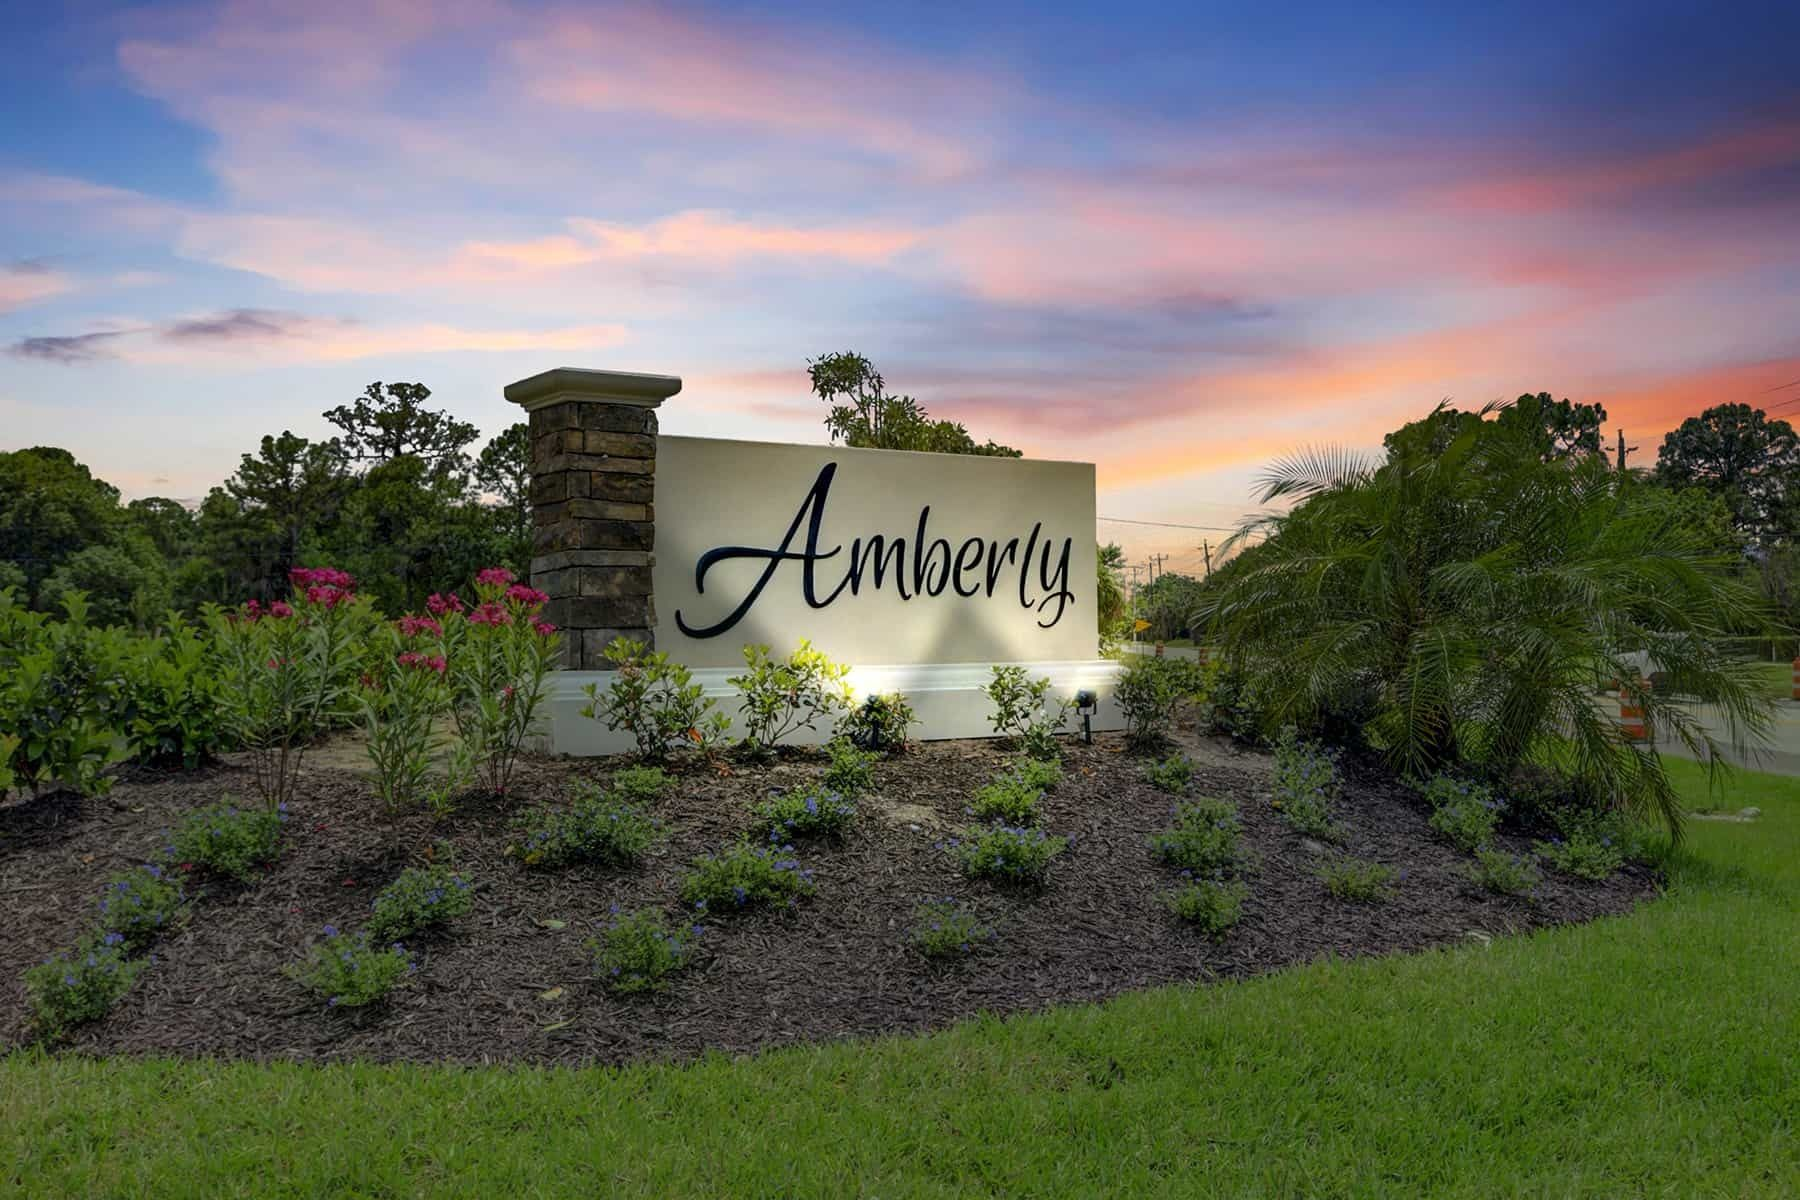 Amberly Entrance